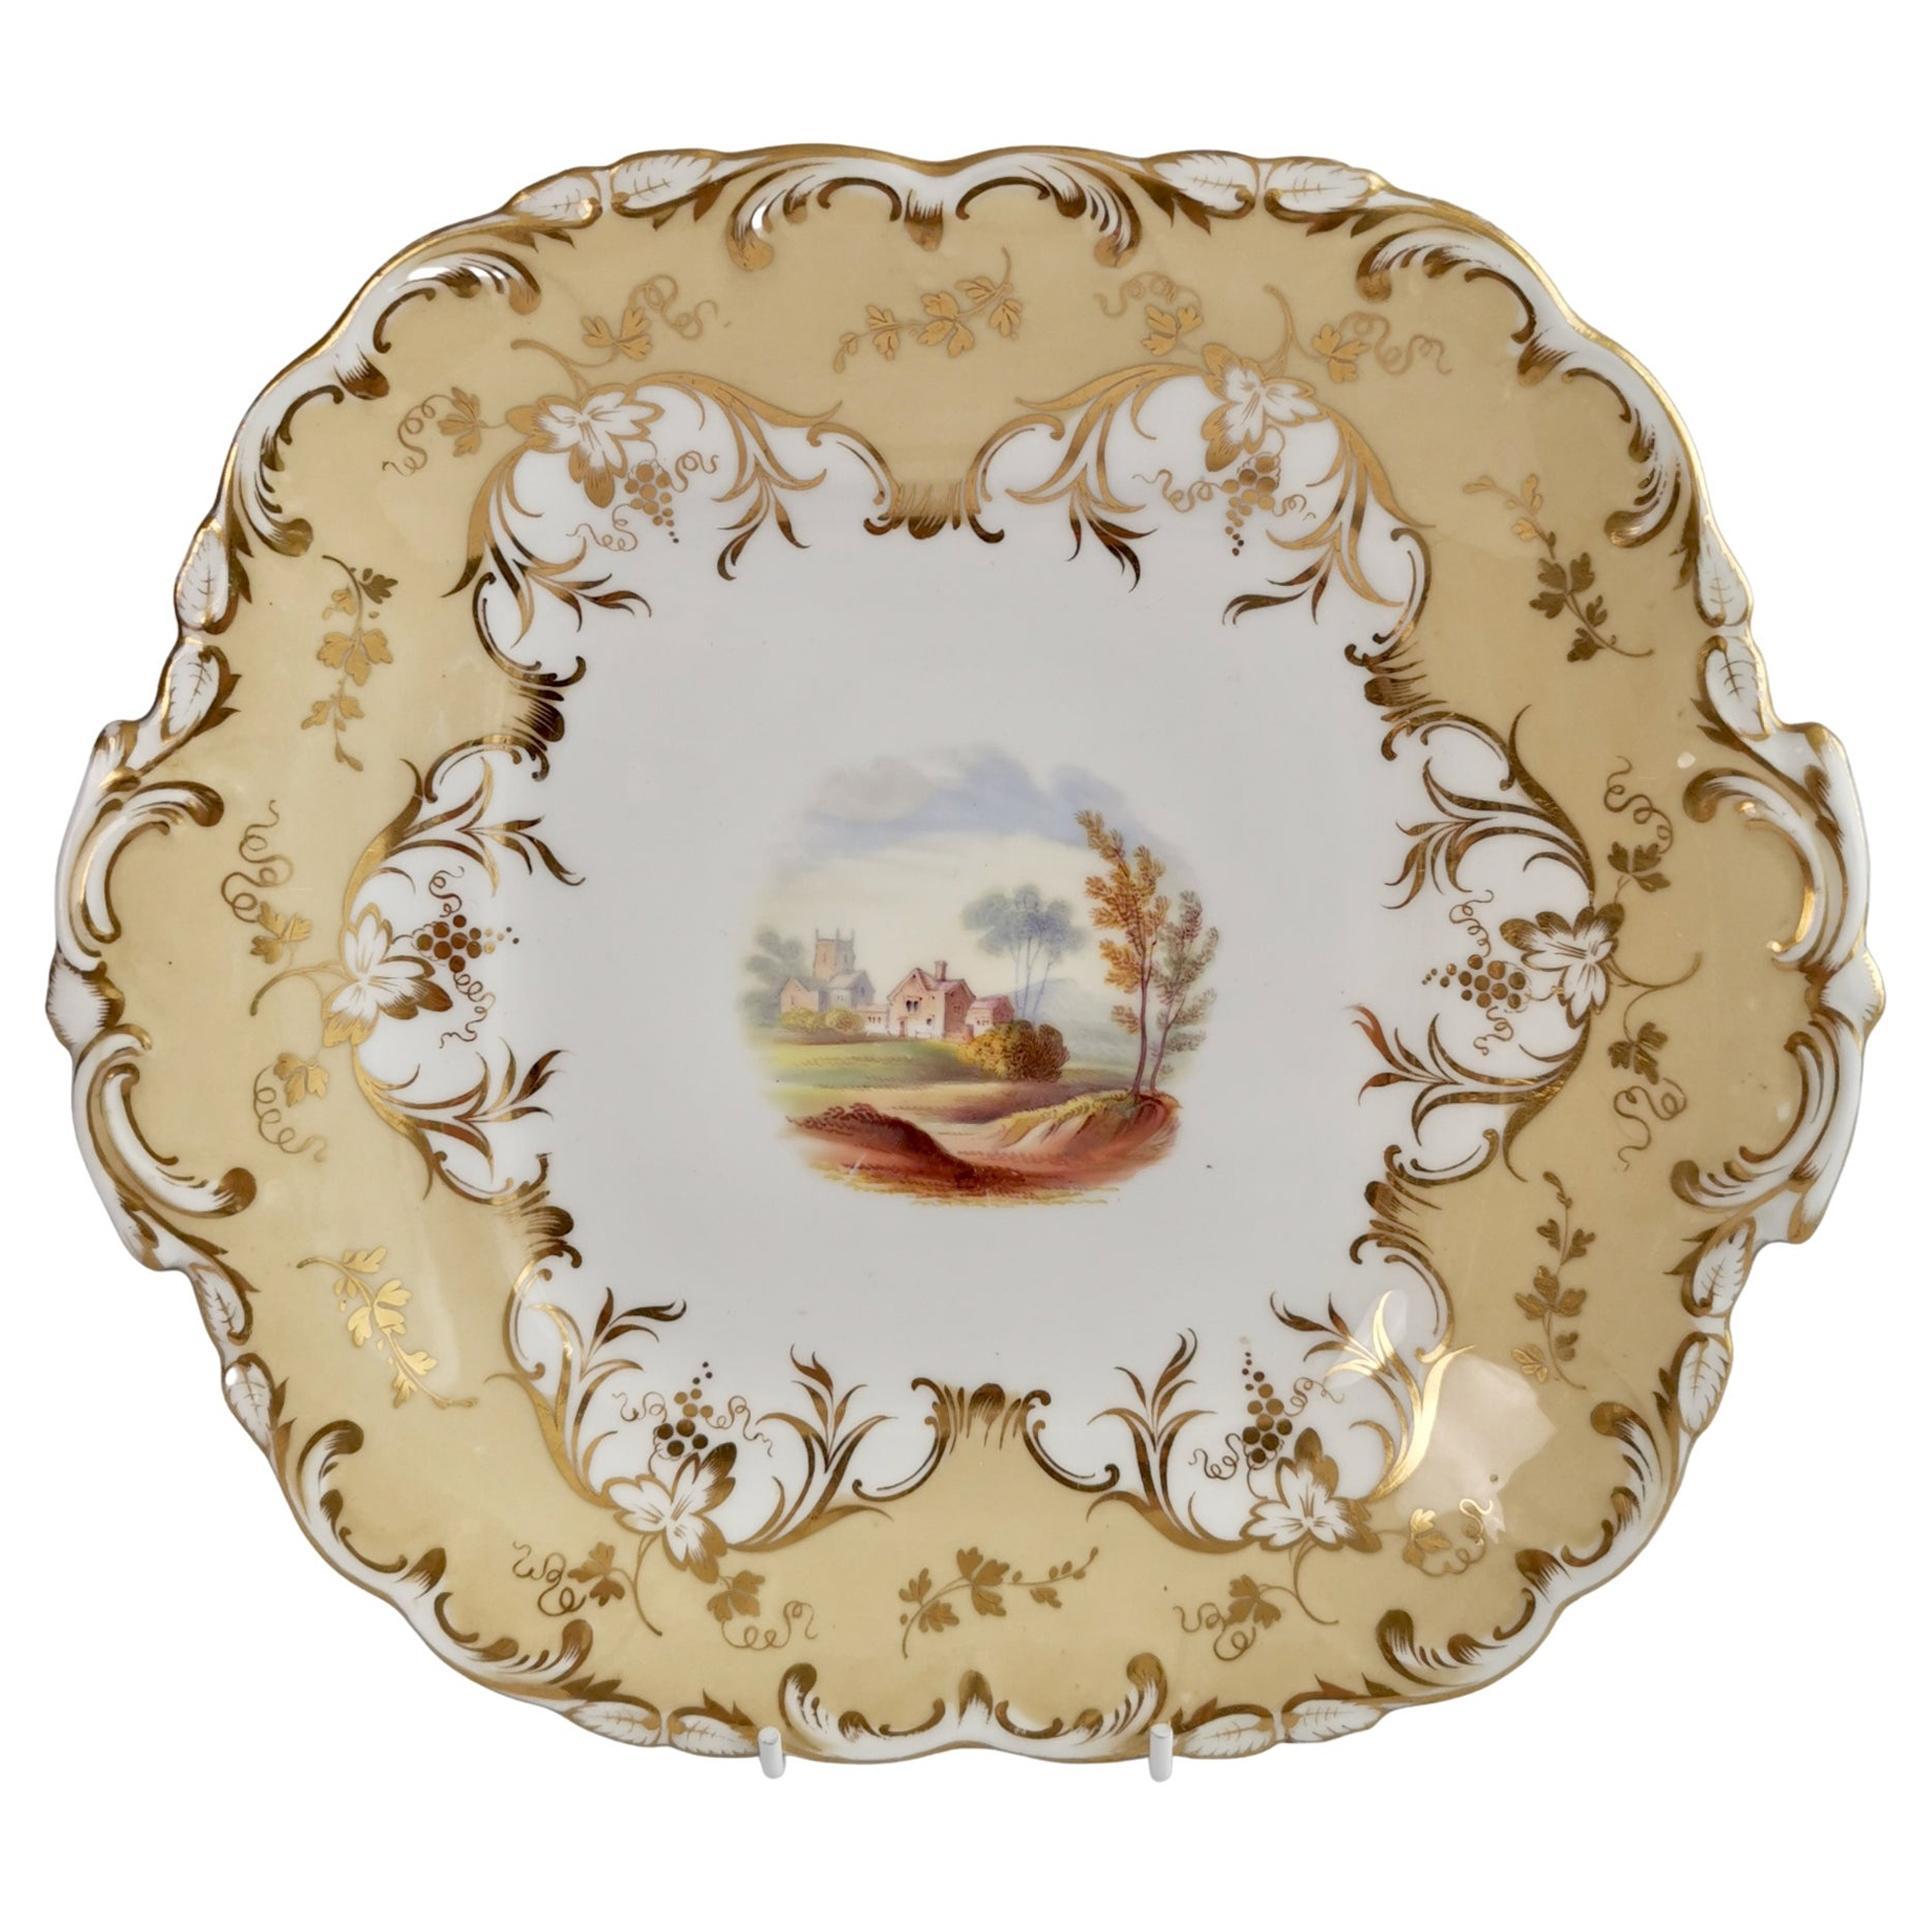 Coalport Porcelain Cake Plate, Beige with Landscapes, Rococo Revival, ca 1840